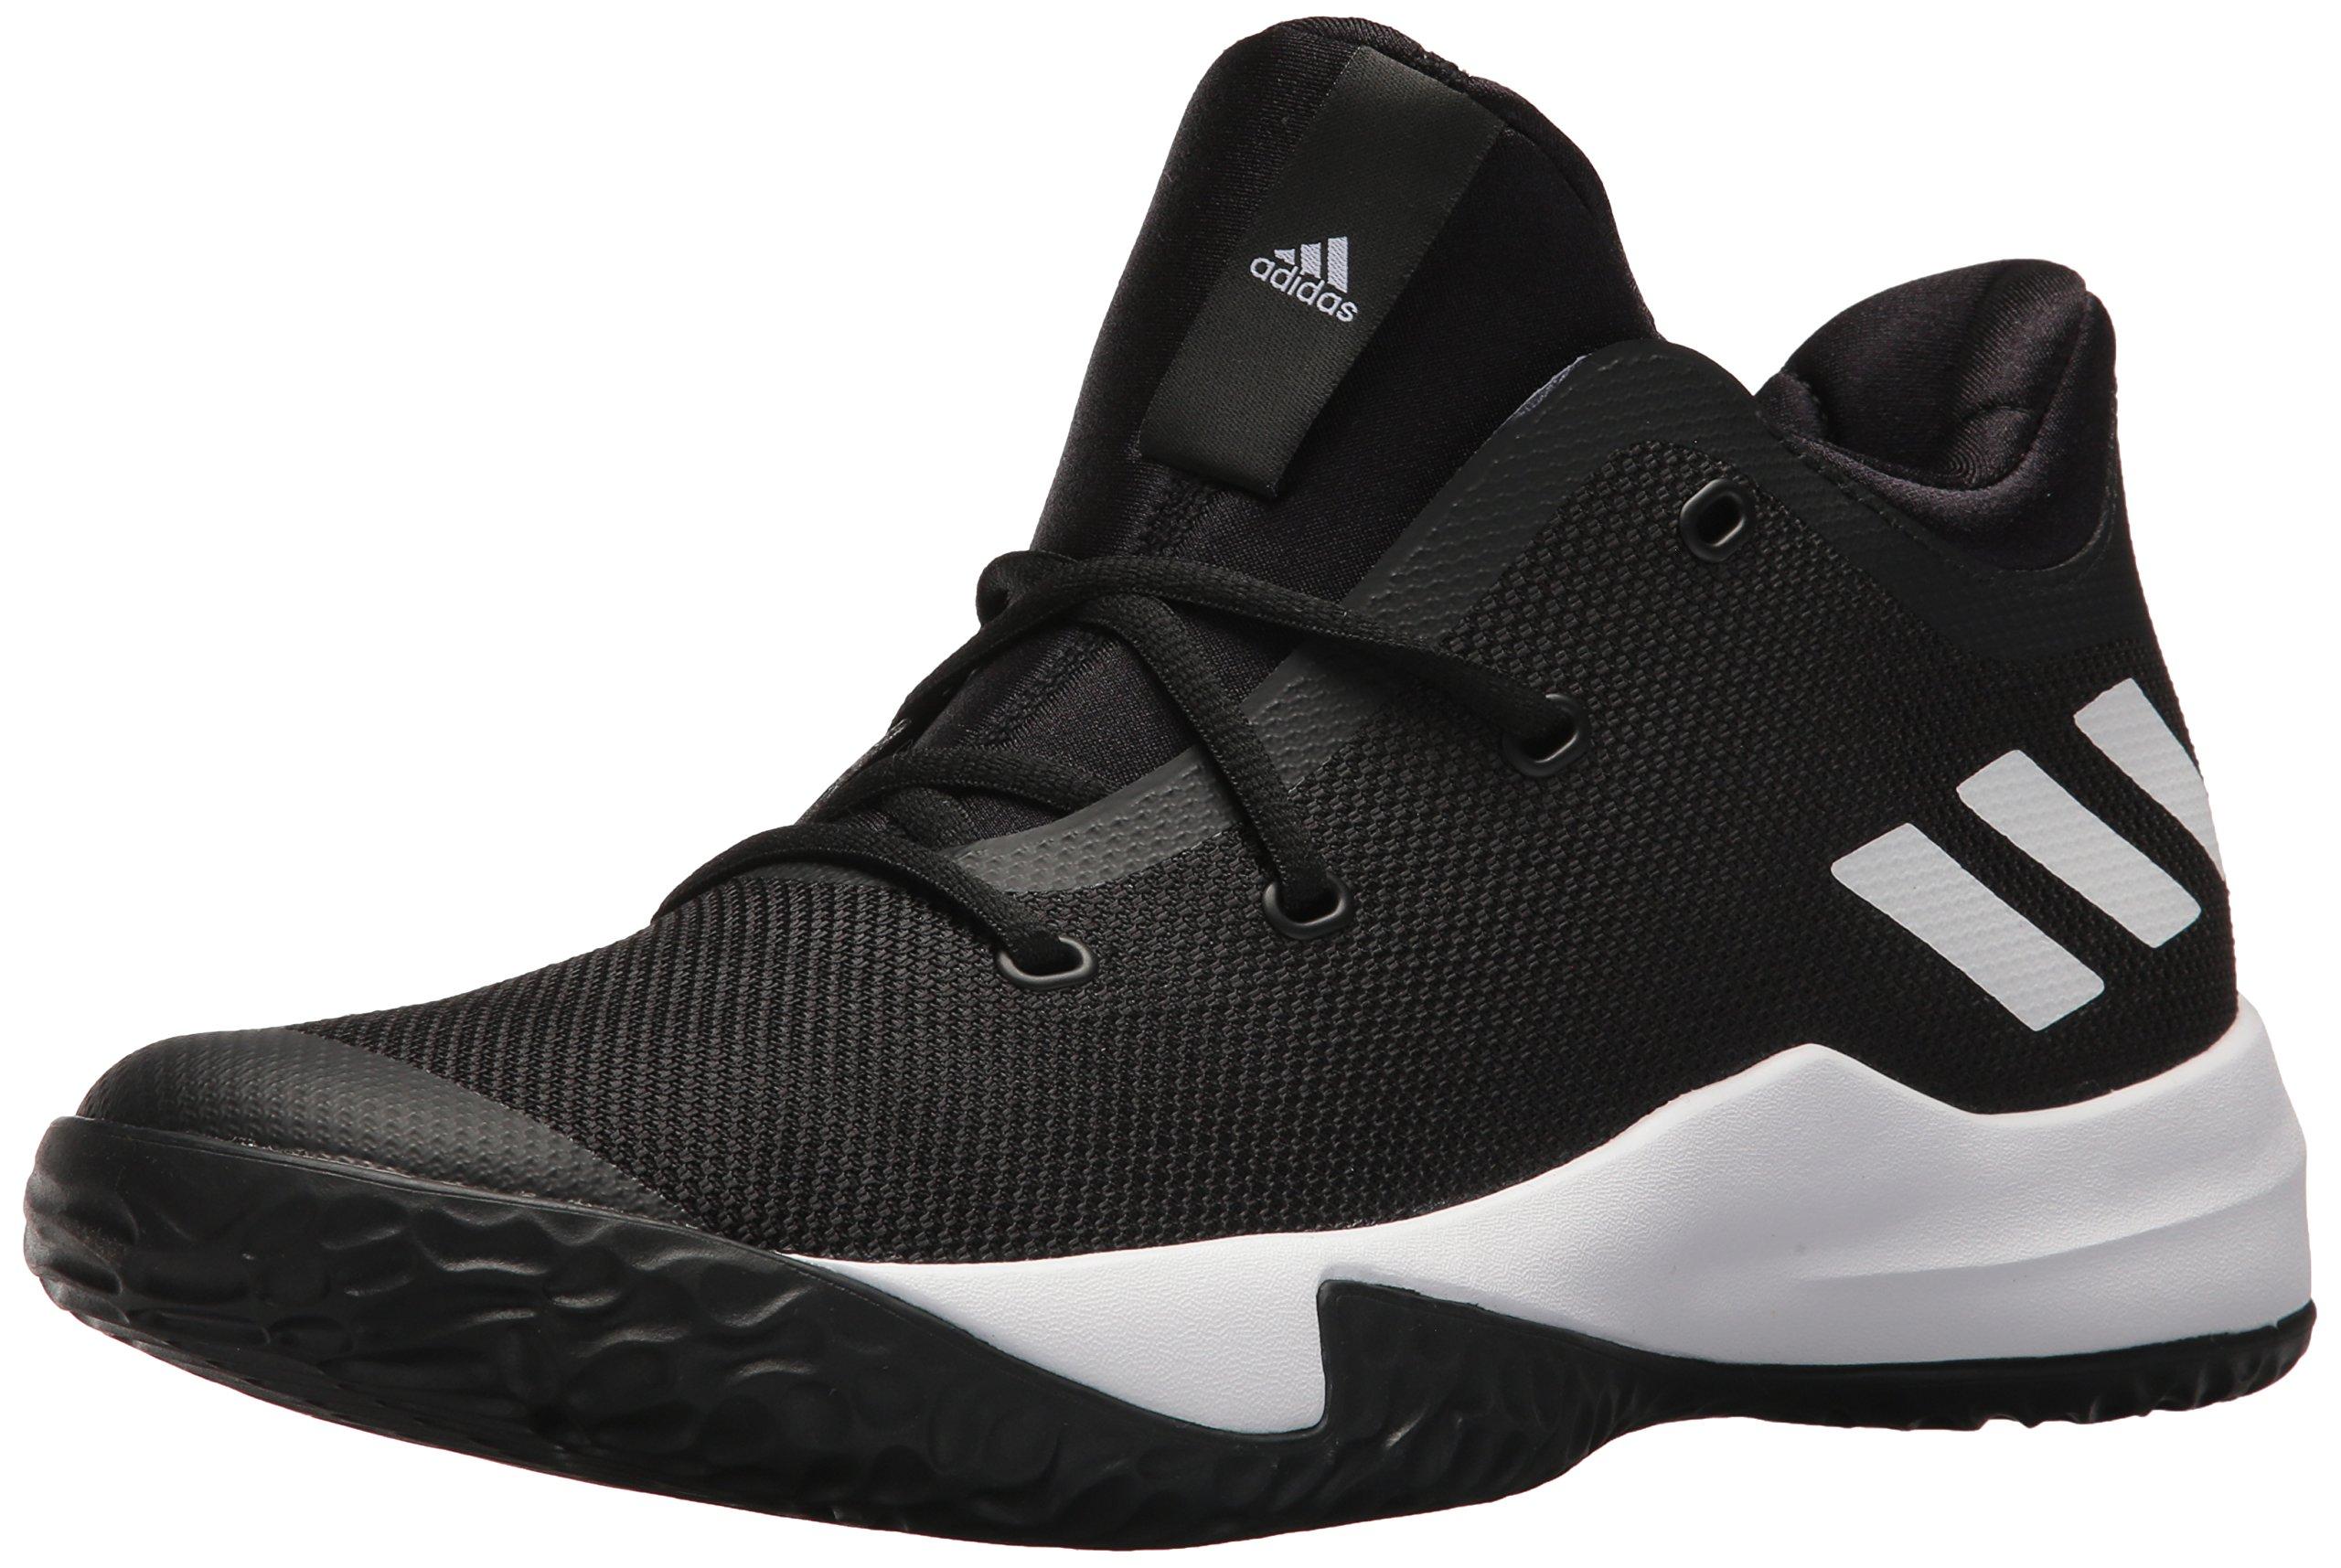 adidas Performance Men's Rise up 2 Basketball Shoe, White/White/White, 12 M US